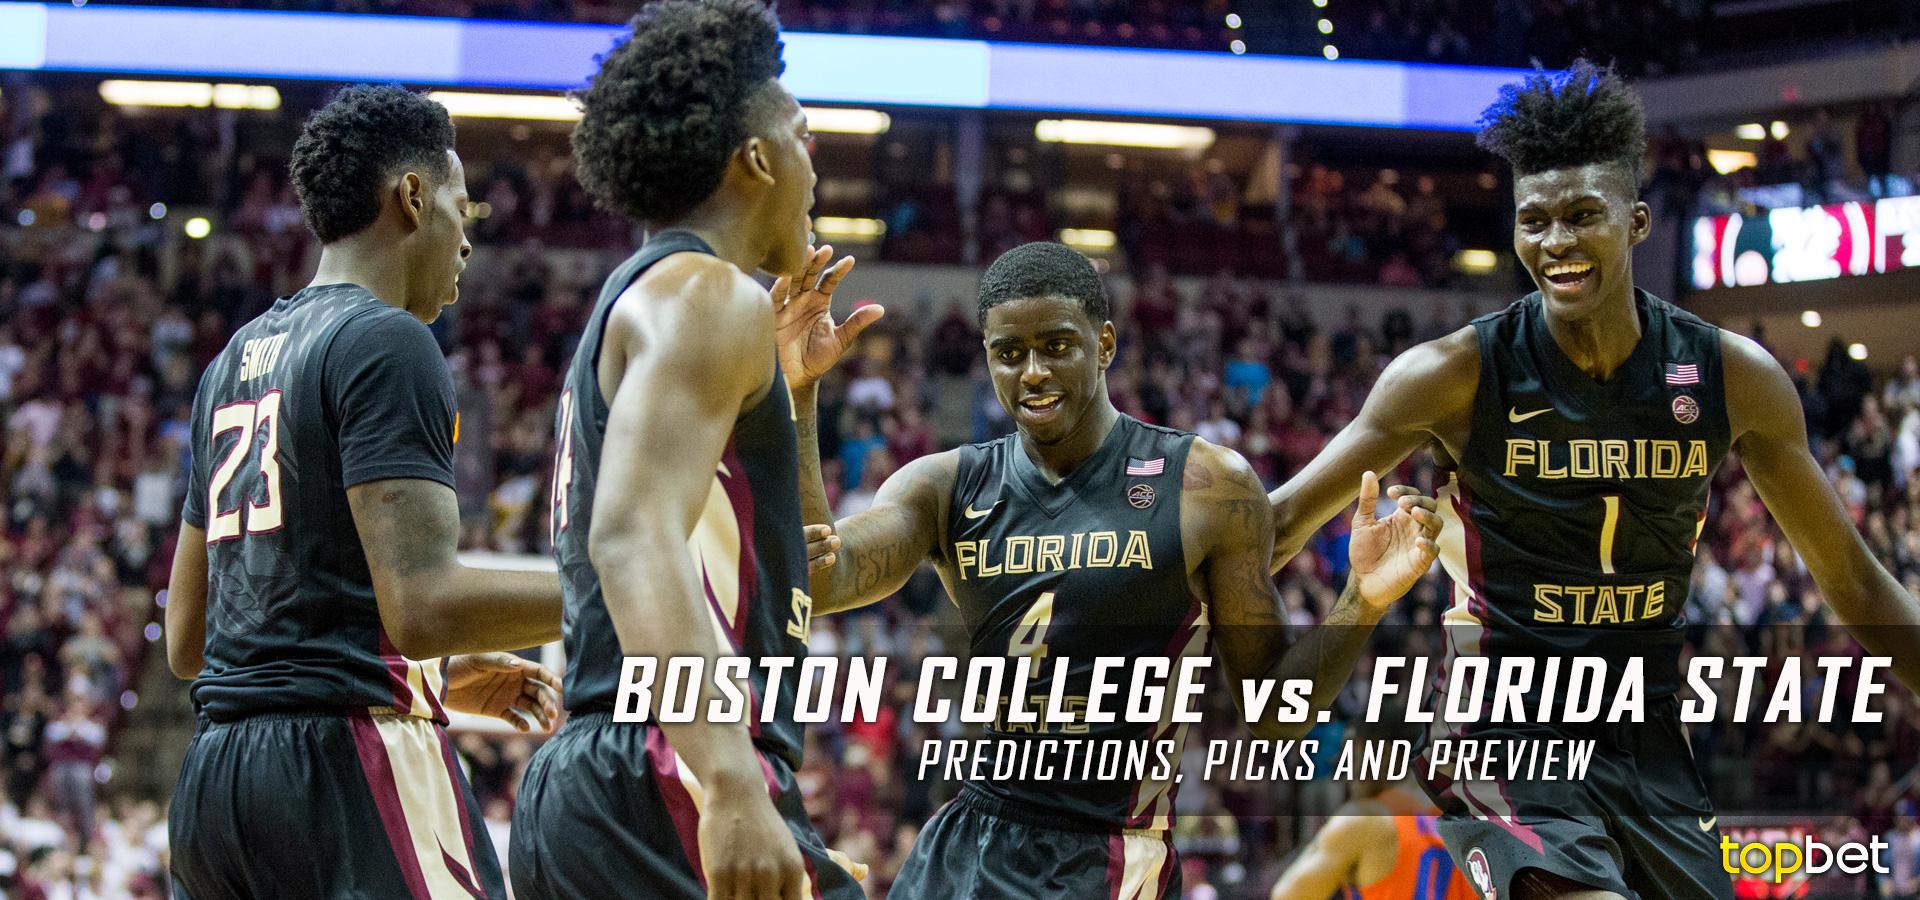 Boston College vs Florida State Basketball Predictions & Picks